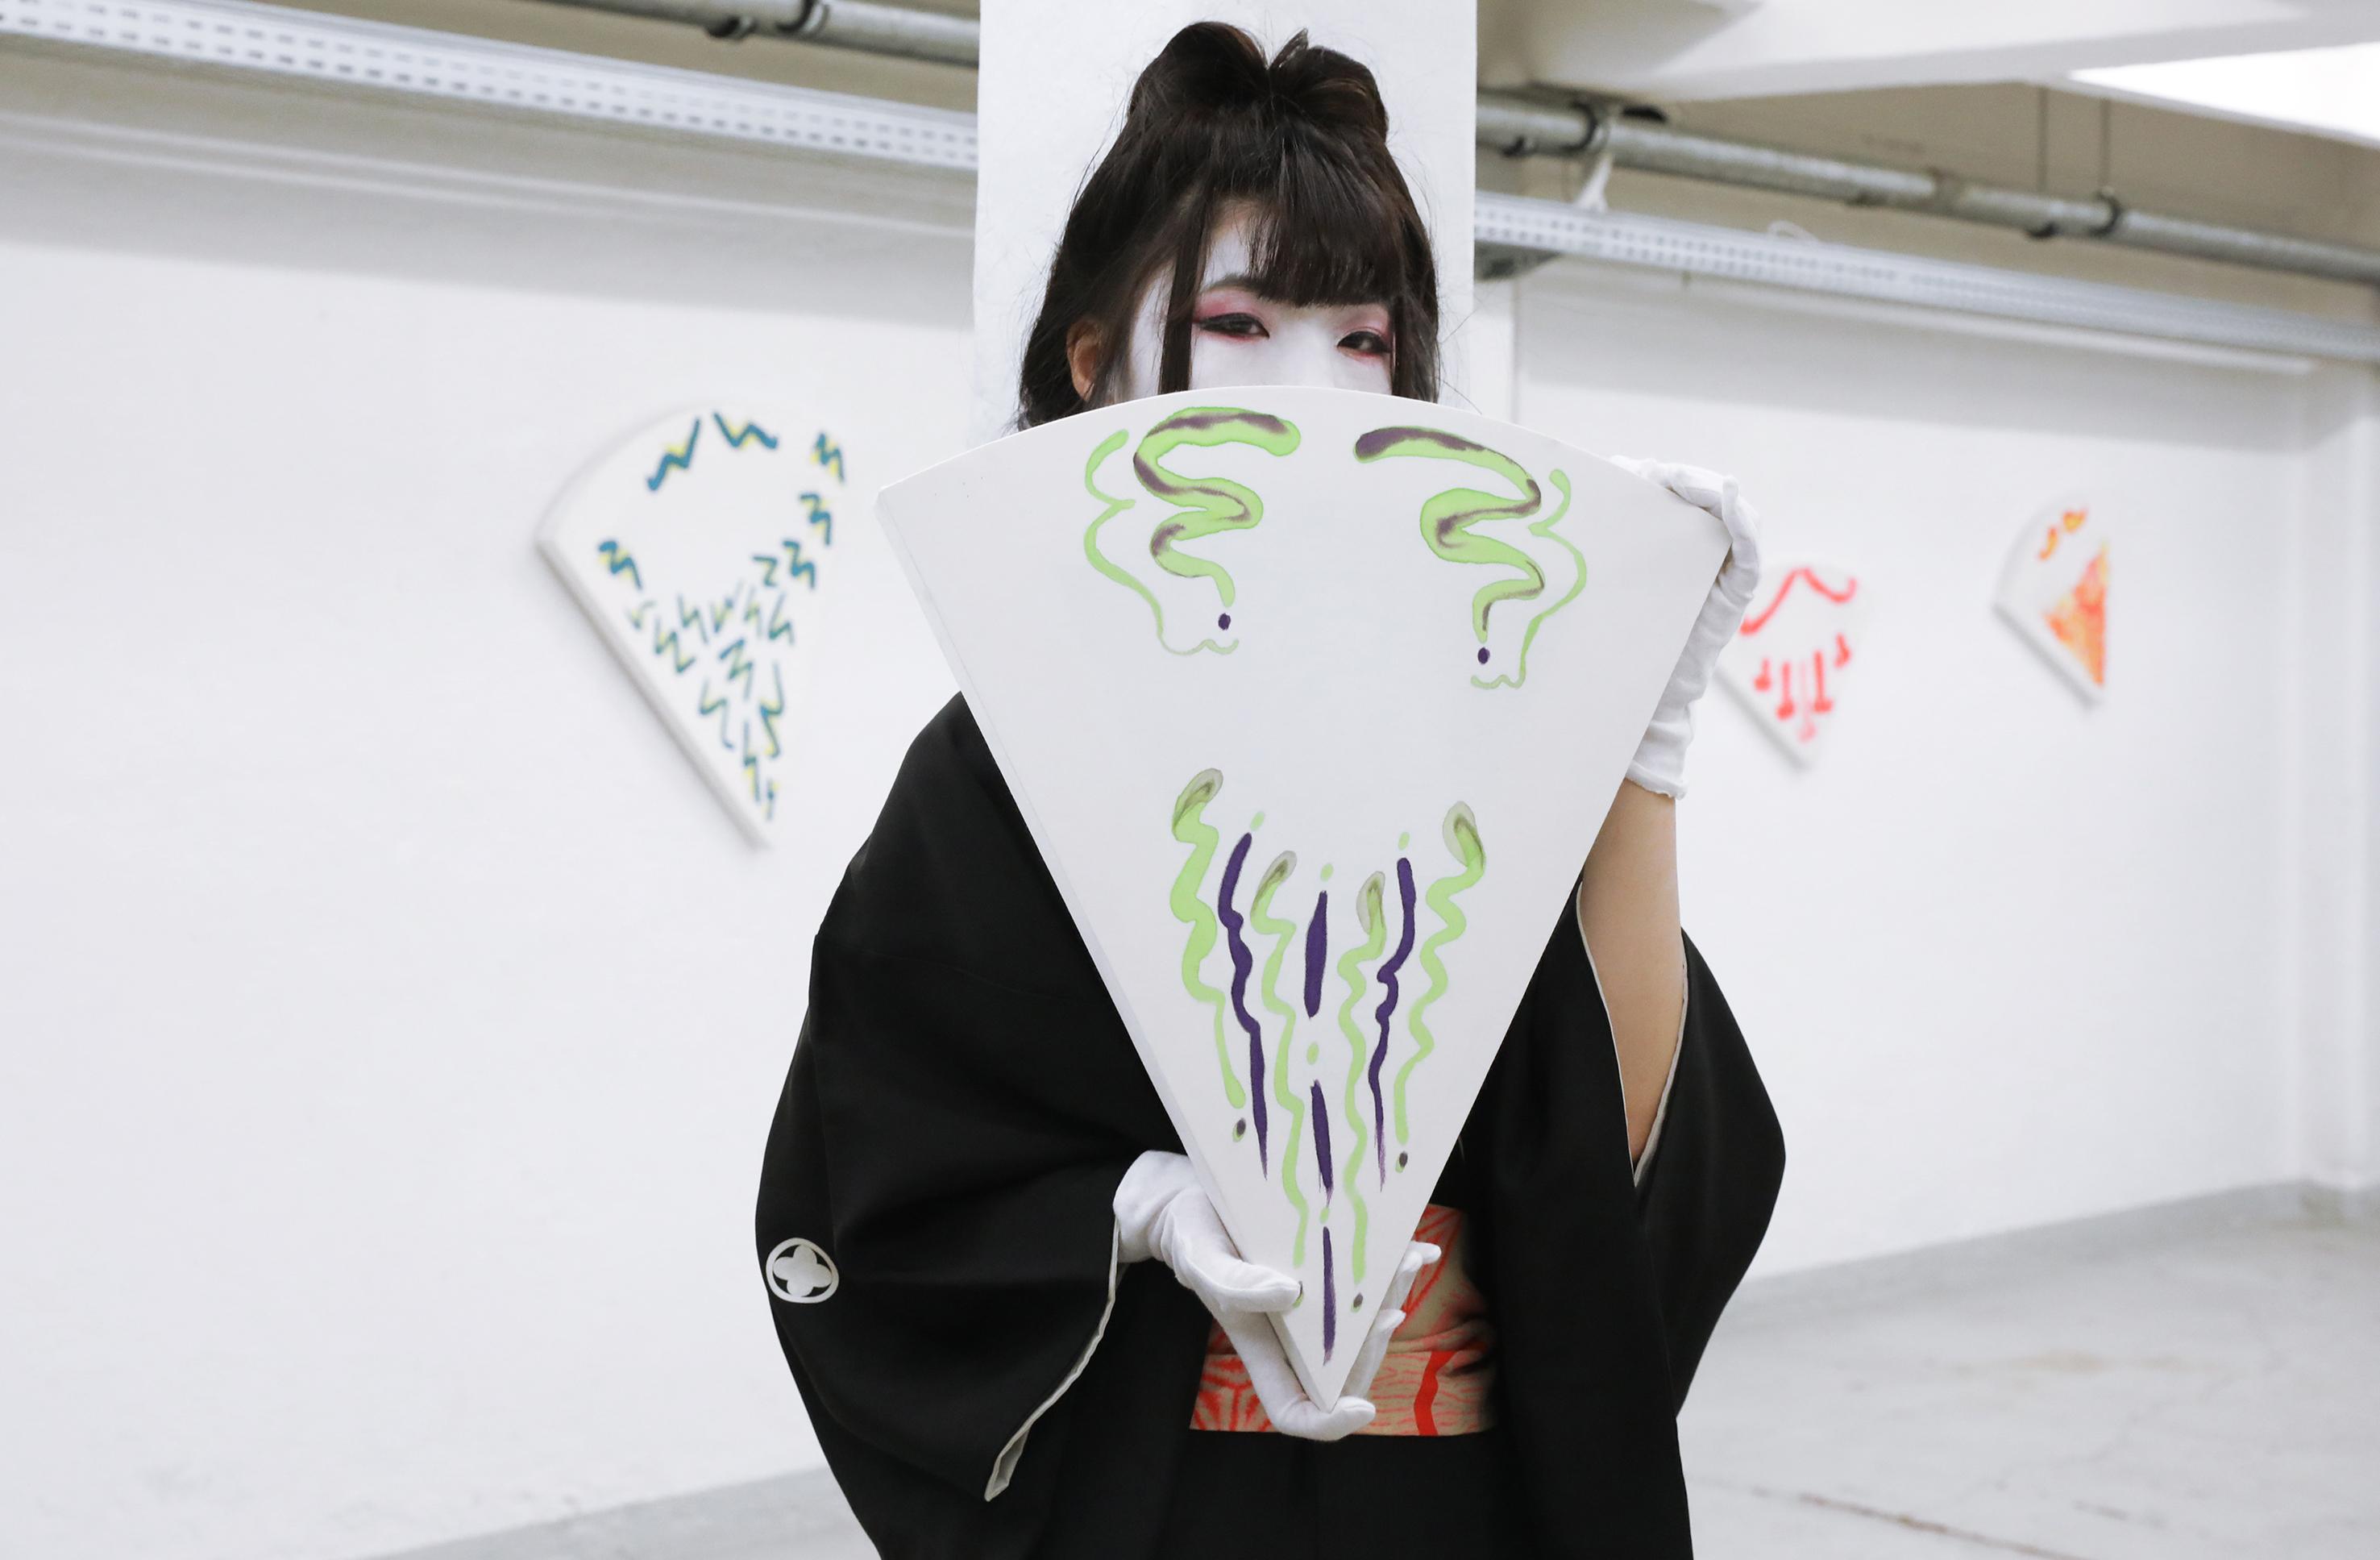 Sensu Hinge, 2017 Performance Performer: Liu Jun Mei Photo: Sara Scanderebech